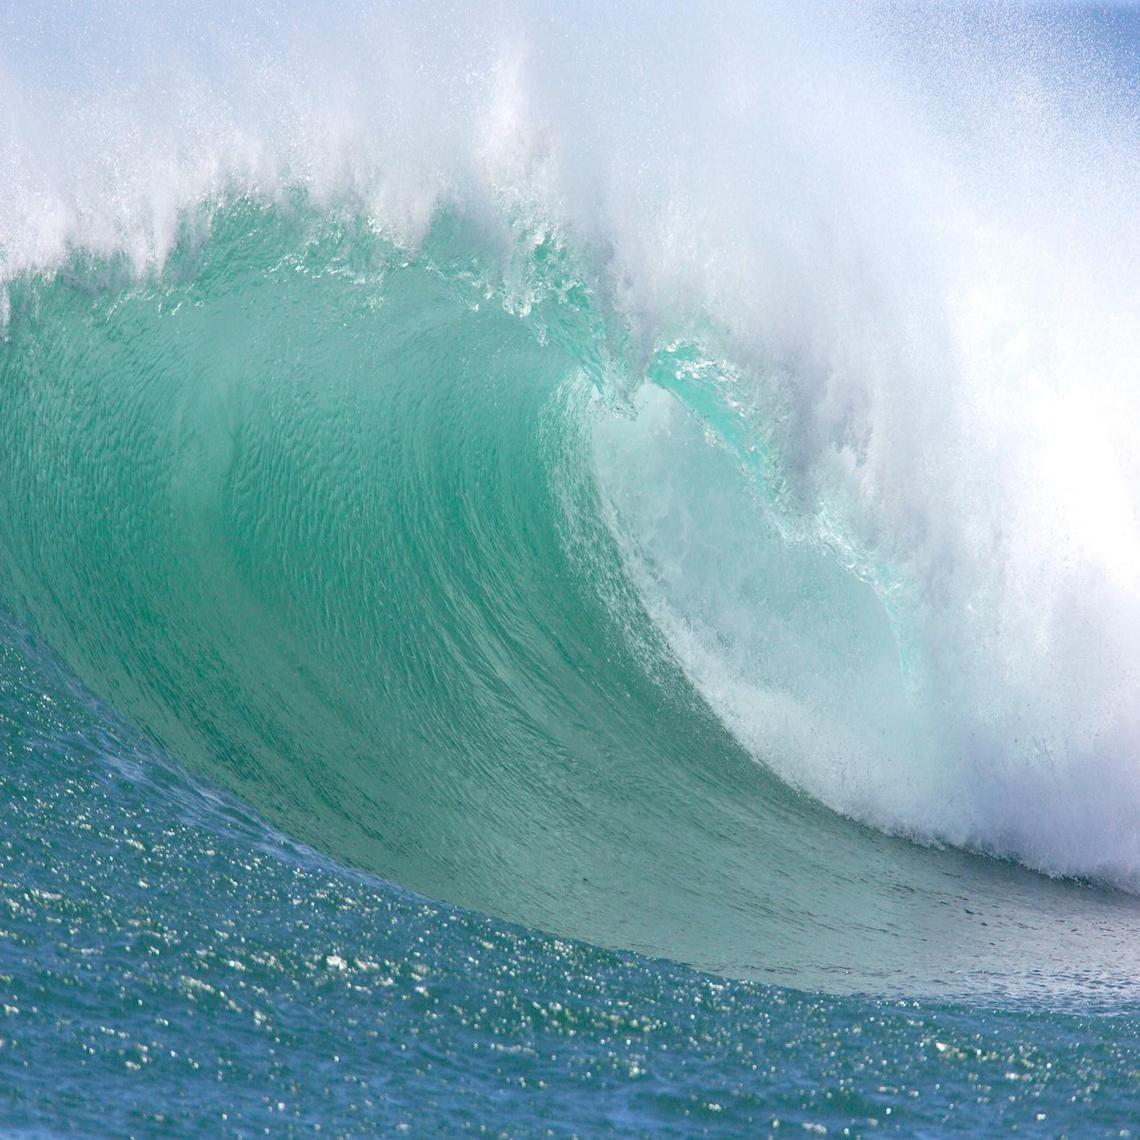 OCEAN WAVE HD